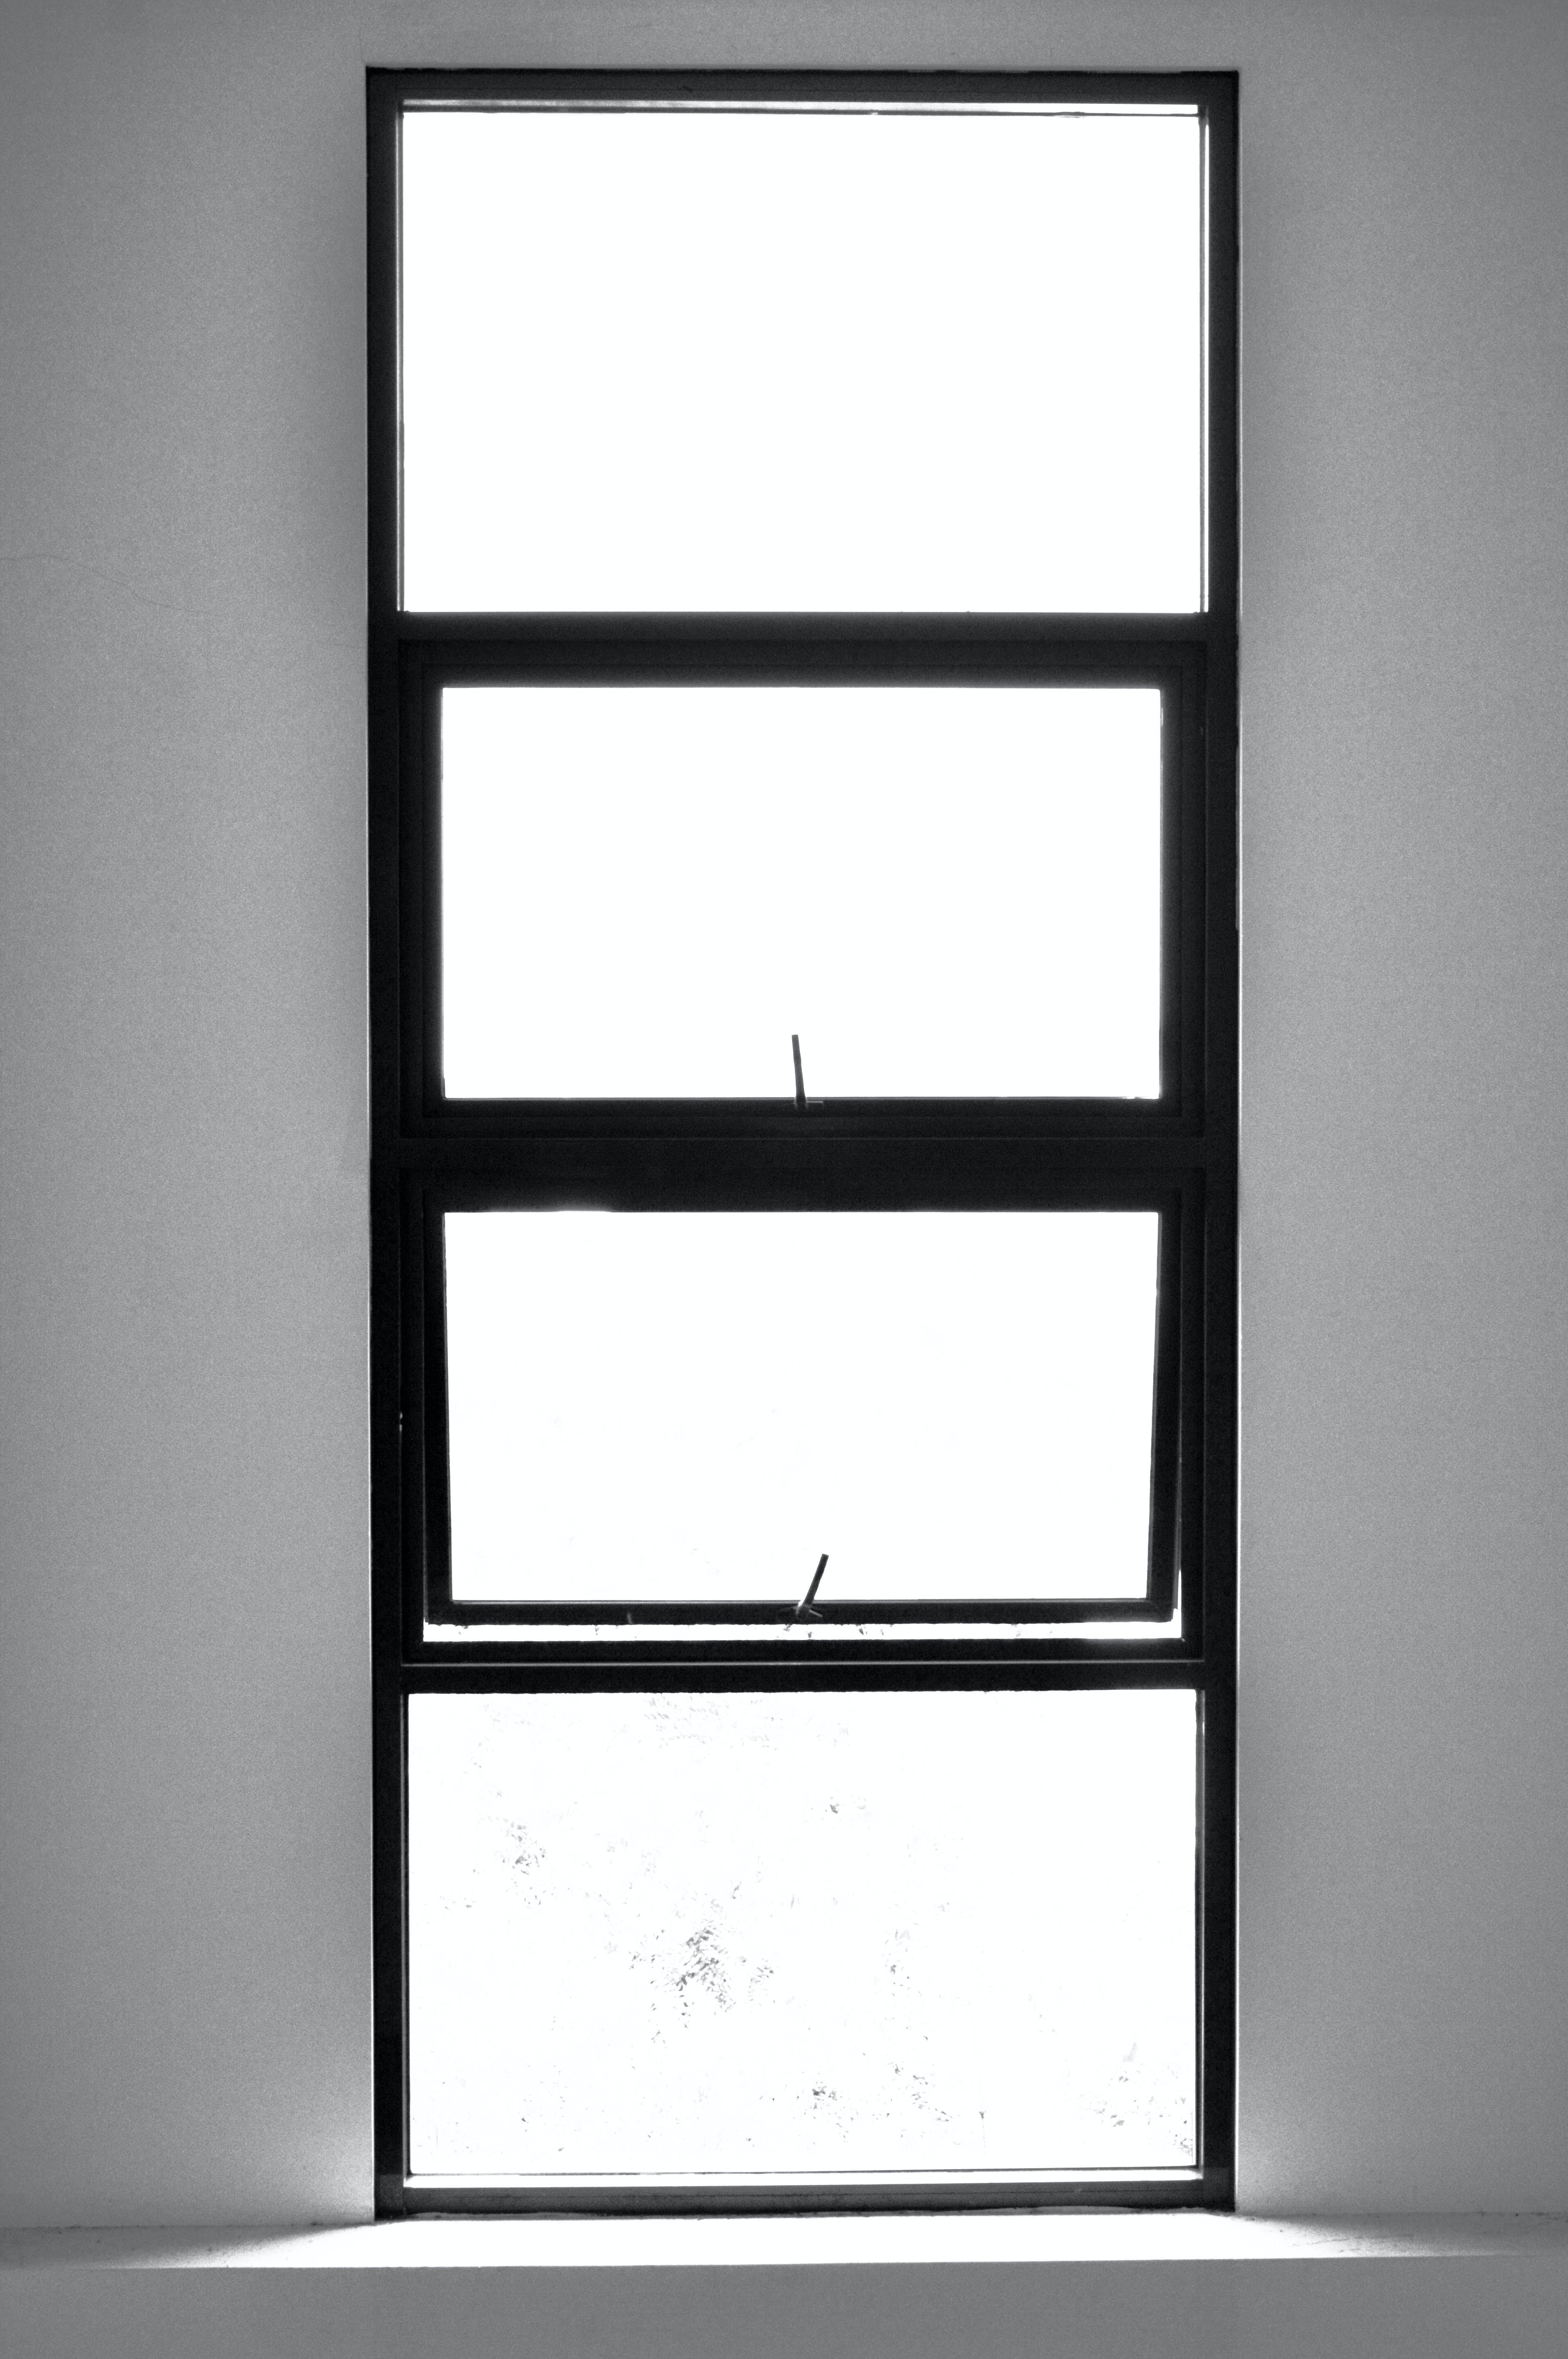 Free stock photo of light, window, black and white, minimalsm